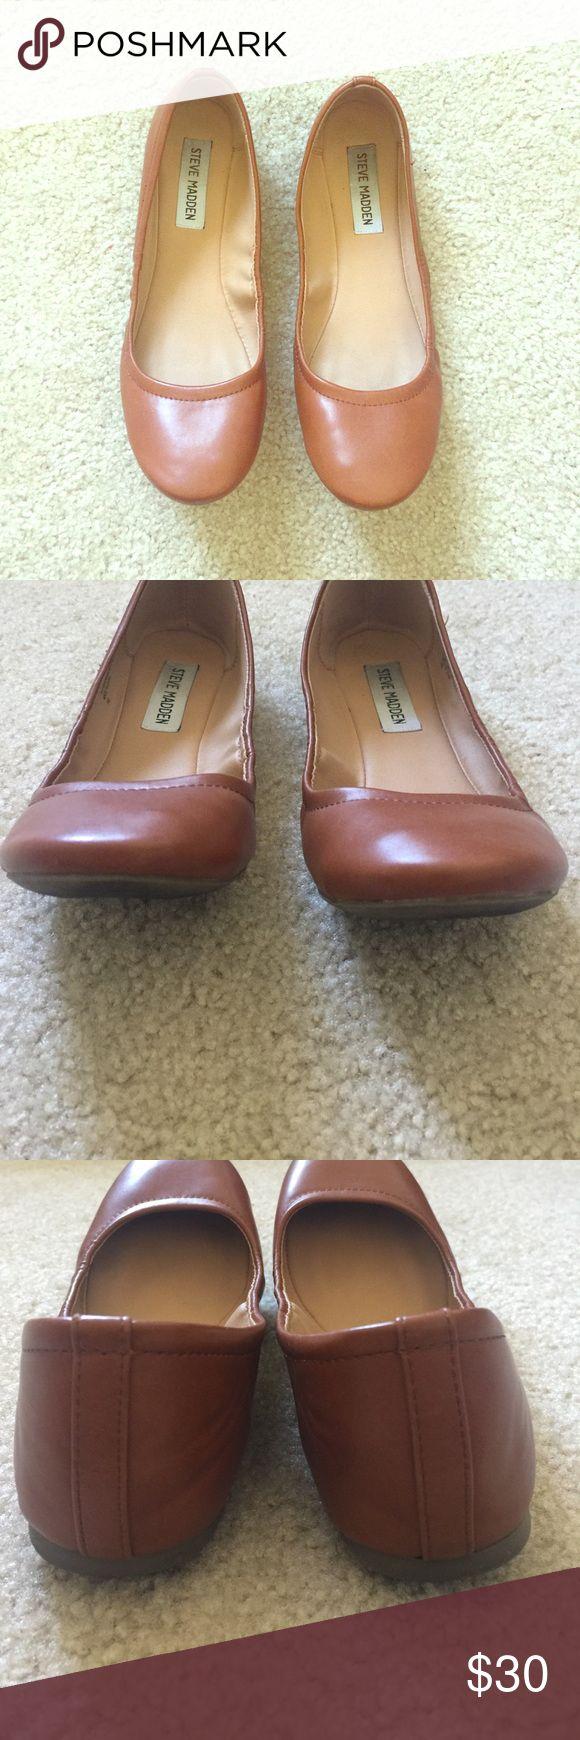 Steve Madden Tan Brown Ballet Flats Excellent condition! No scuffs. Only worn twice. Make an offer! Steve Madden Shoes